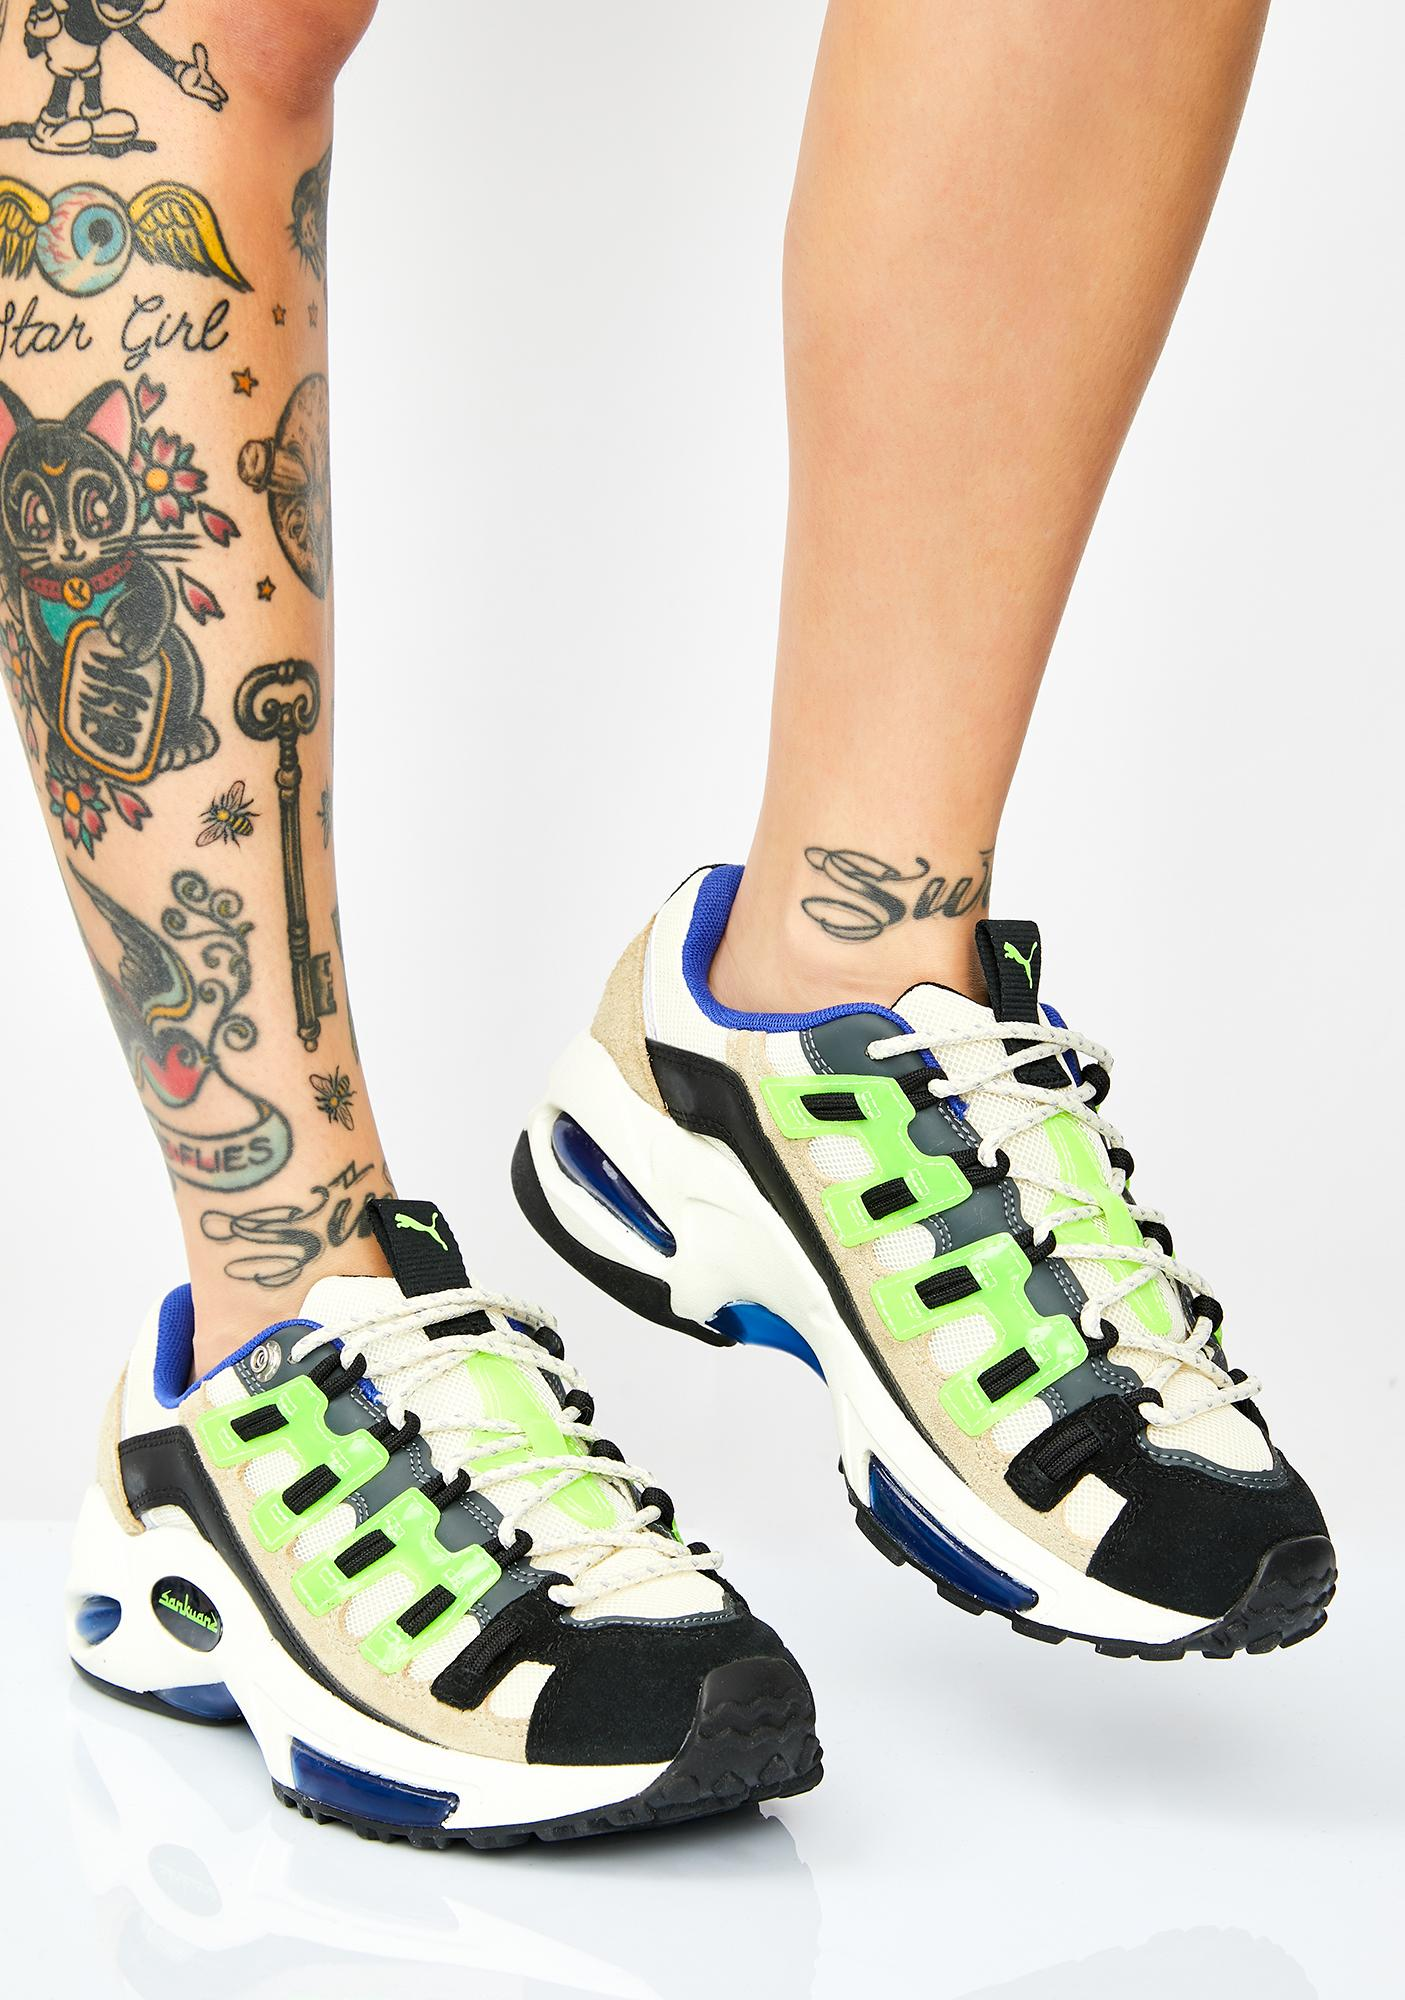 PUMA Cell Endura X Sankuanz Sneakers  a924dbe6c